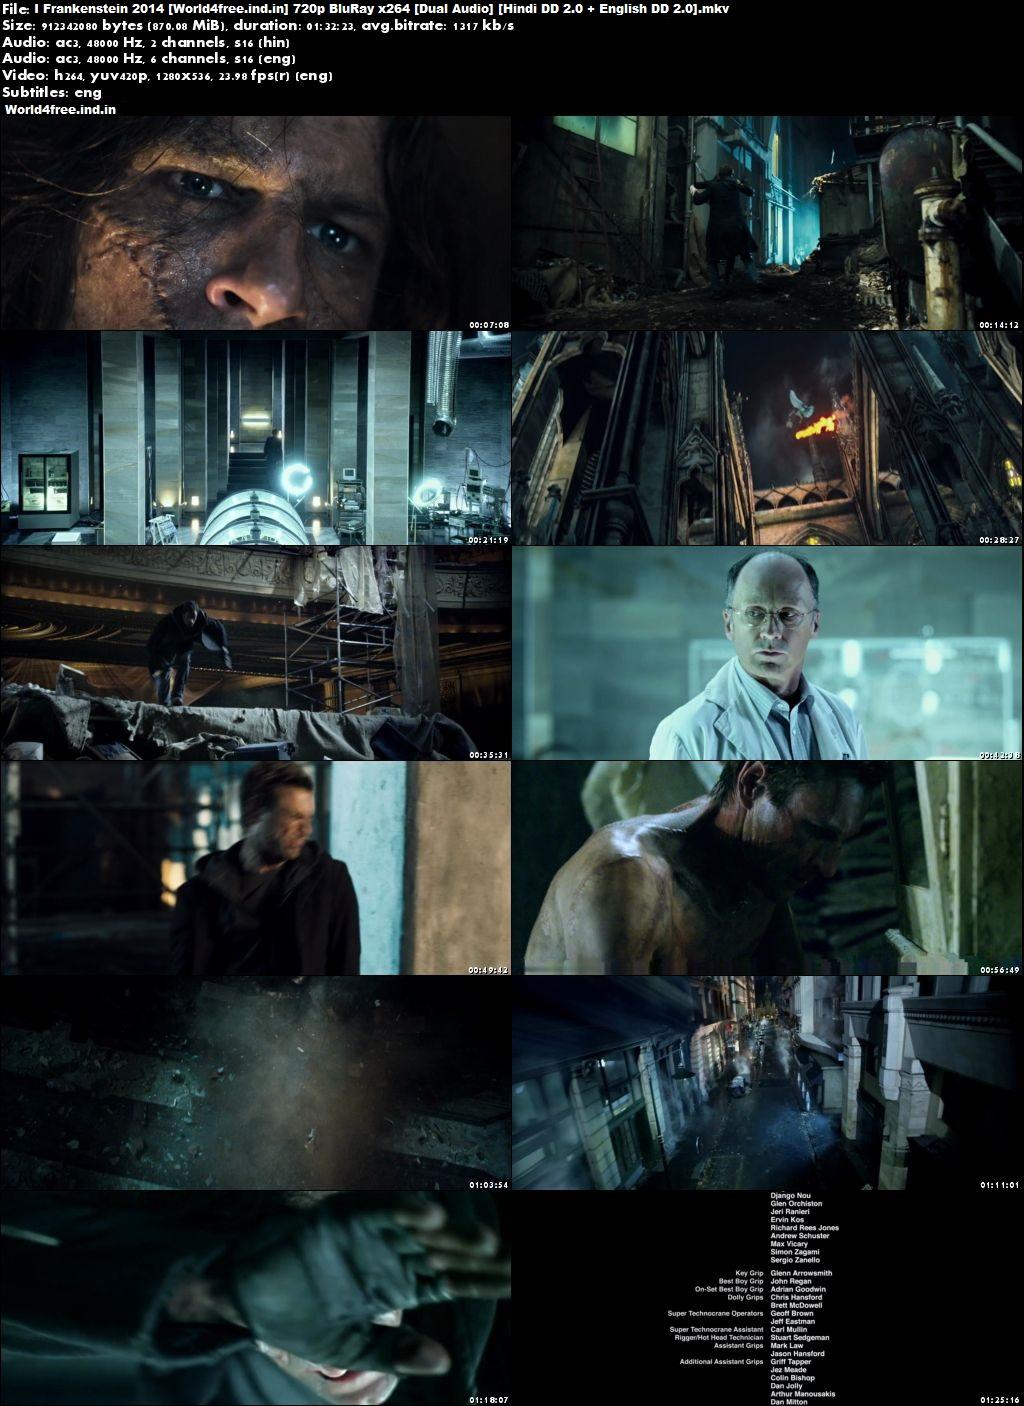 I Frankenstein 2014 world4free.ind.in Dual Audio BRRip 720p In Hindi English